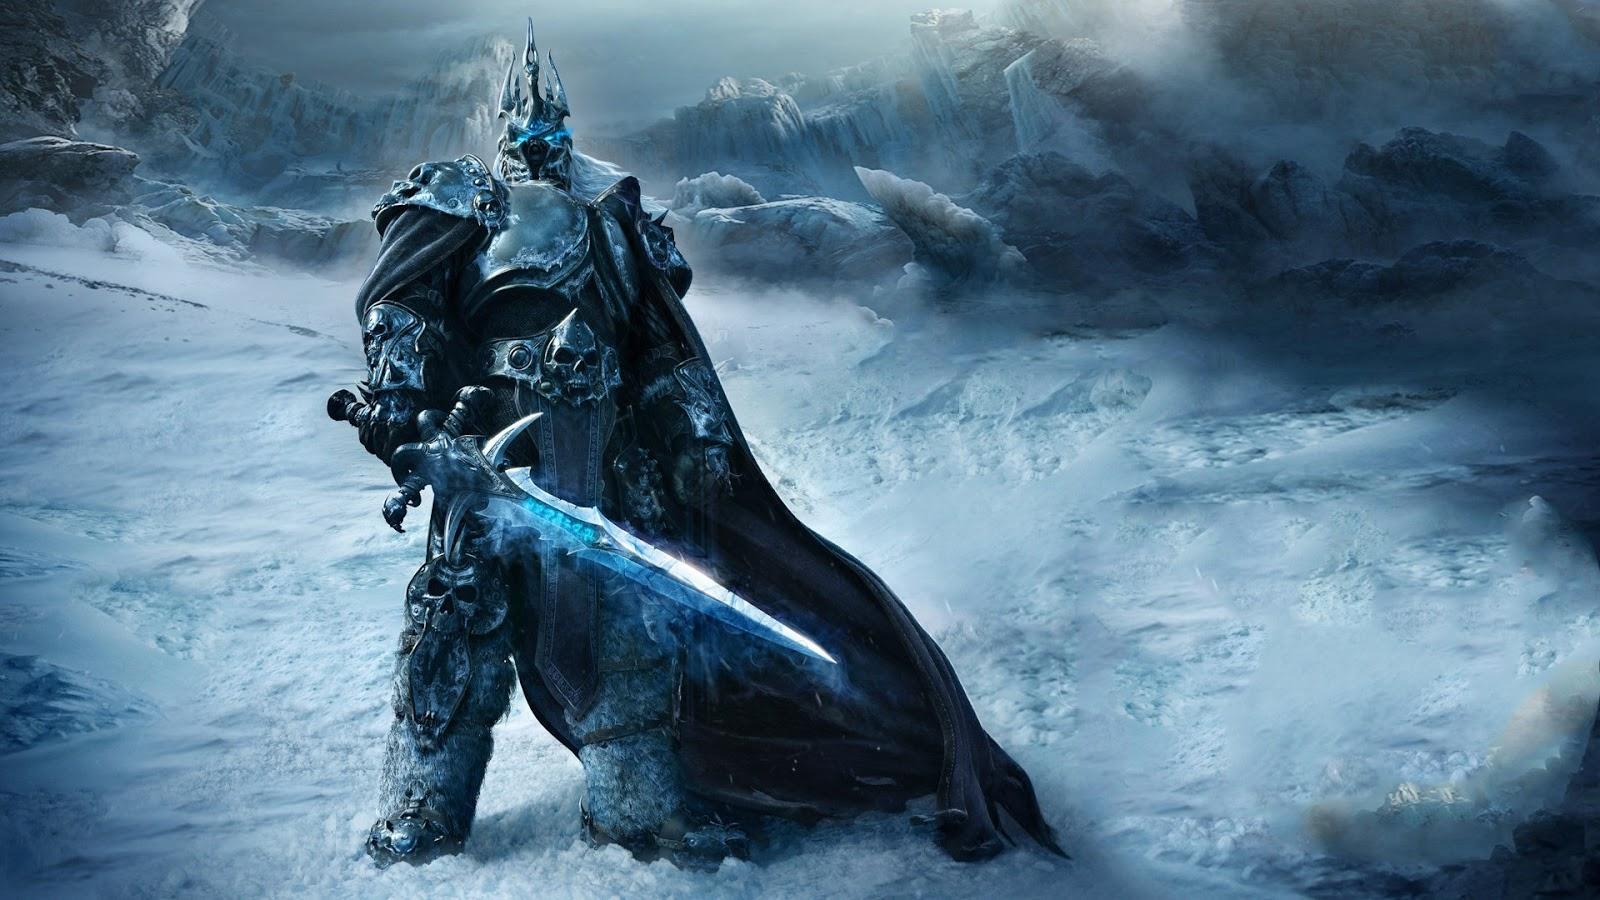 http://1.bp.blogspot.com/-kwc5DkVeFGk/UQYpXdQFzSI/AAAAAAAAaFc/mTudvXpu2Mo/s1600/world_of_warcraft_wrath_of_the_lich_king-1920x1080.jpg